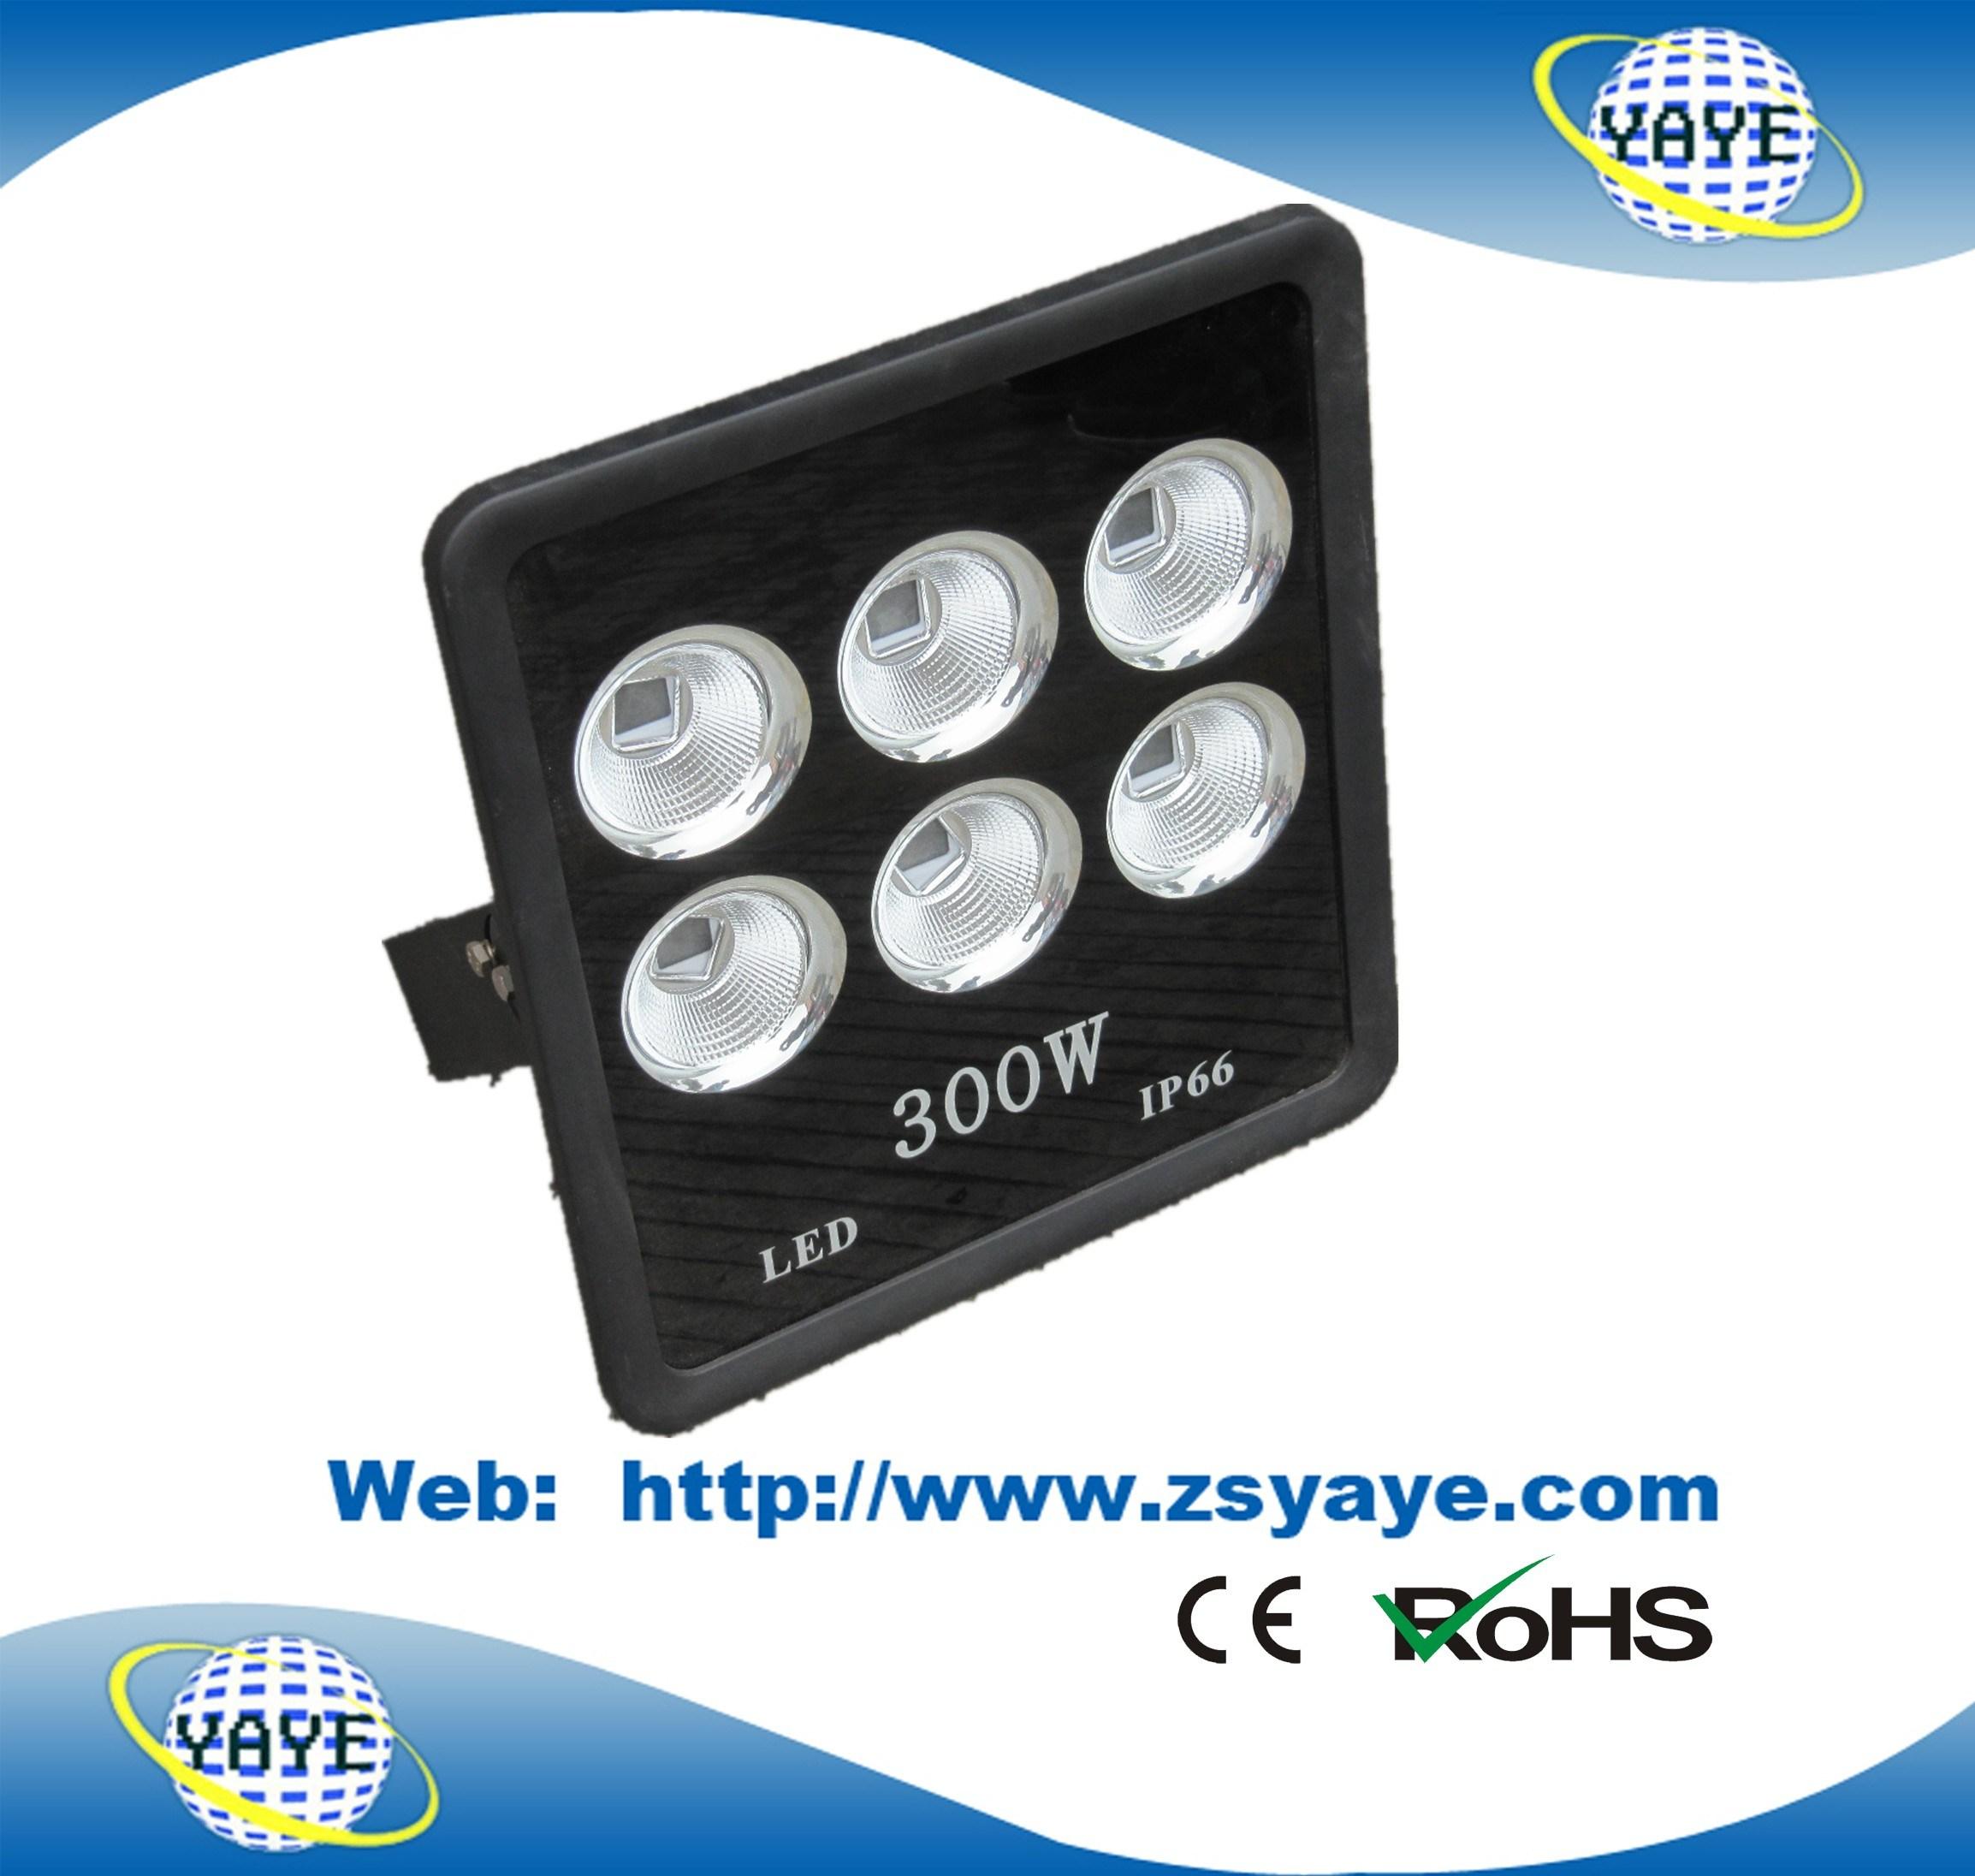 Yaye 18 Ce/RoHS/ 3 Years Warranty COB 200 LED Flood Light/ 200W COB LED Tunnel Light with 24000lm